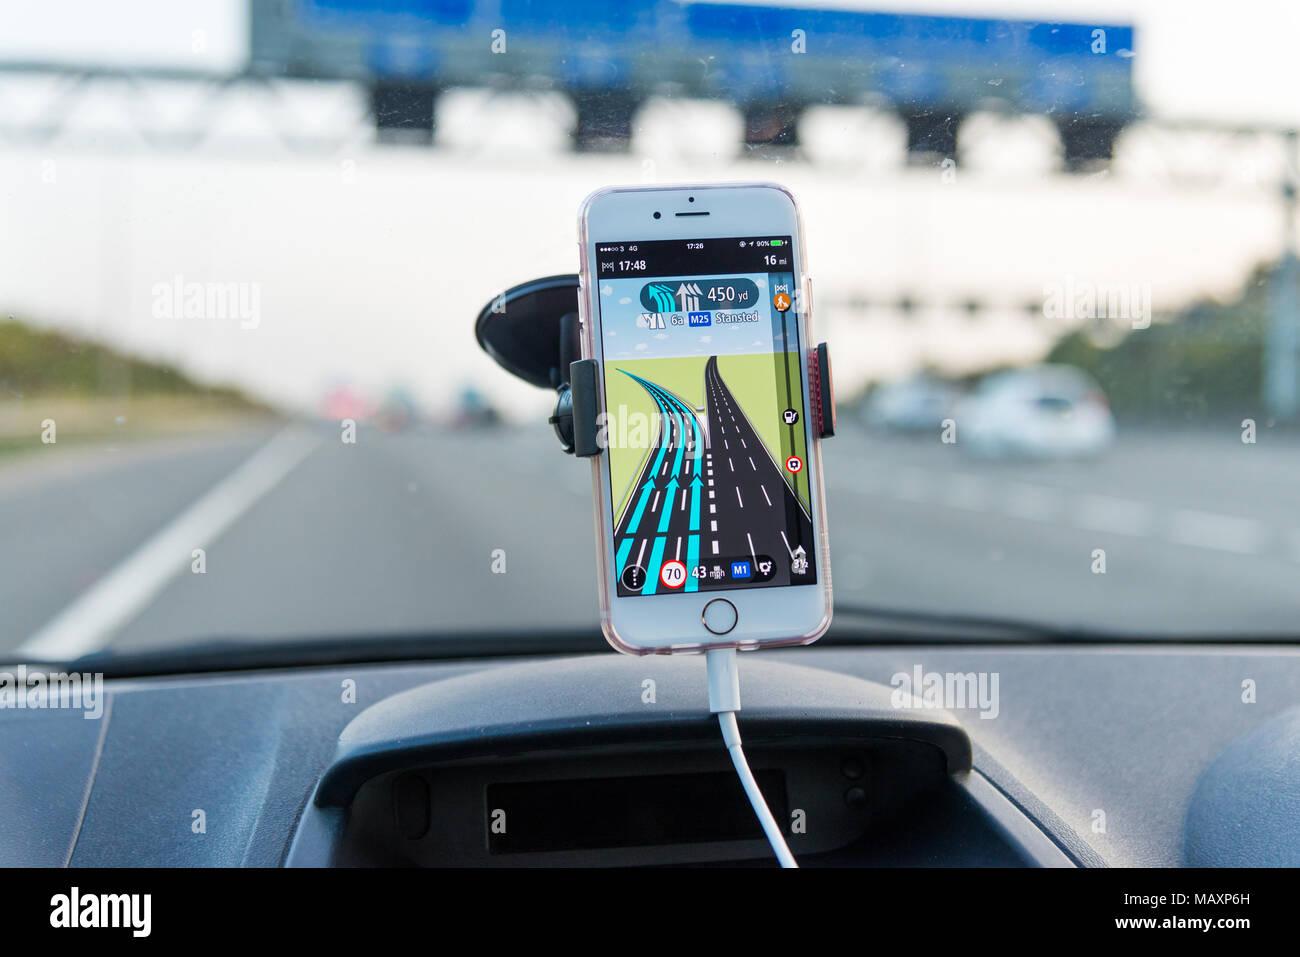 Using TomTom satnav app on iPhone while driving on M25 motorway, UK